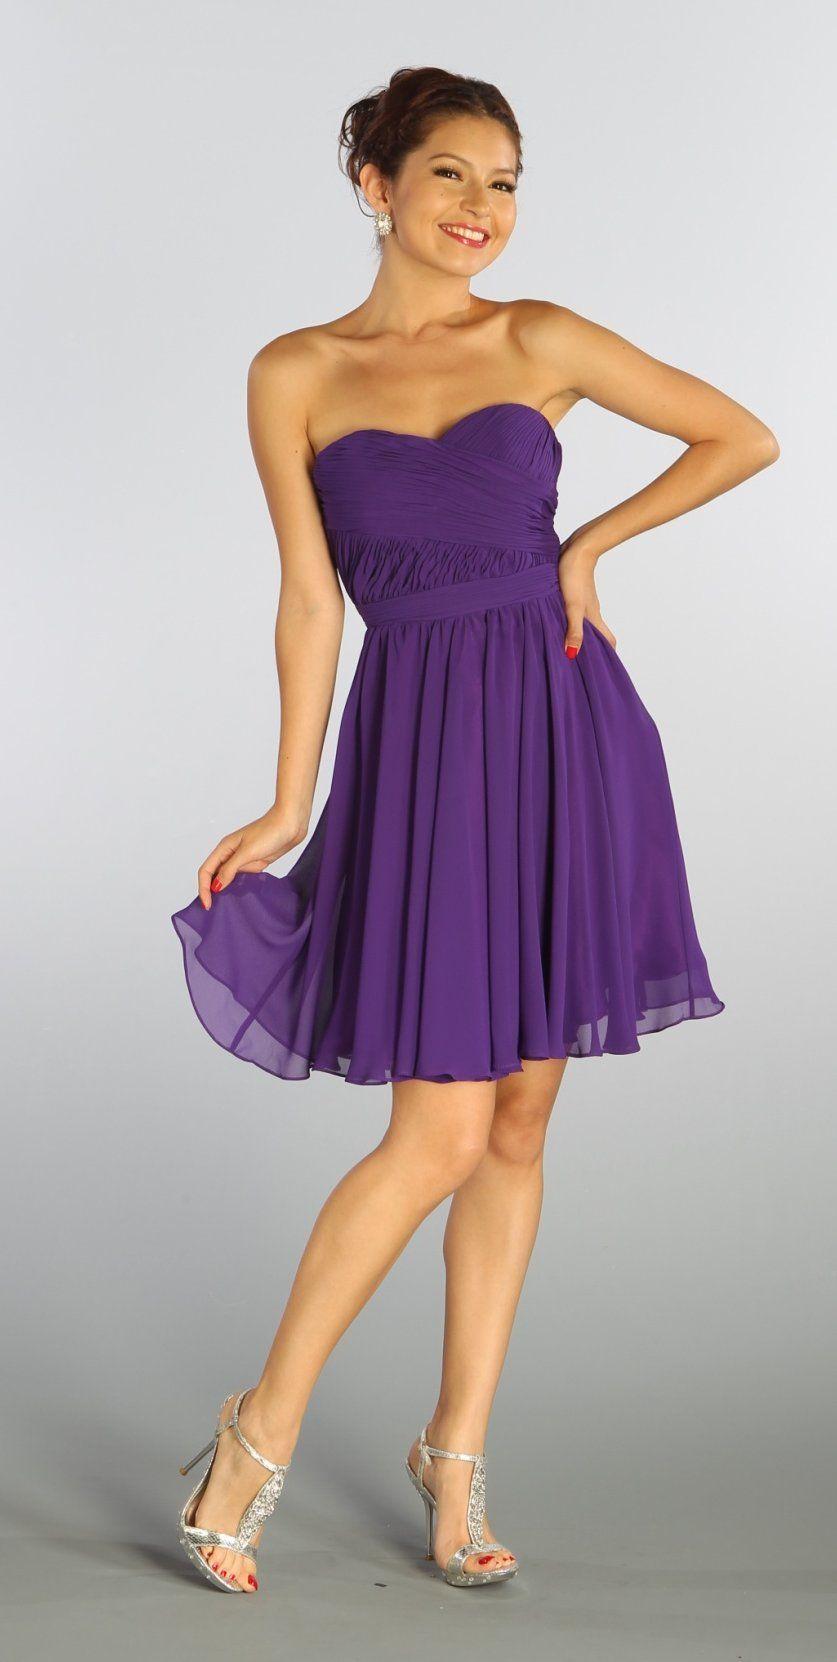 Strapless Chiffon Short Purple Bridesmaid Dress Knee Length ...